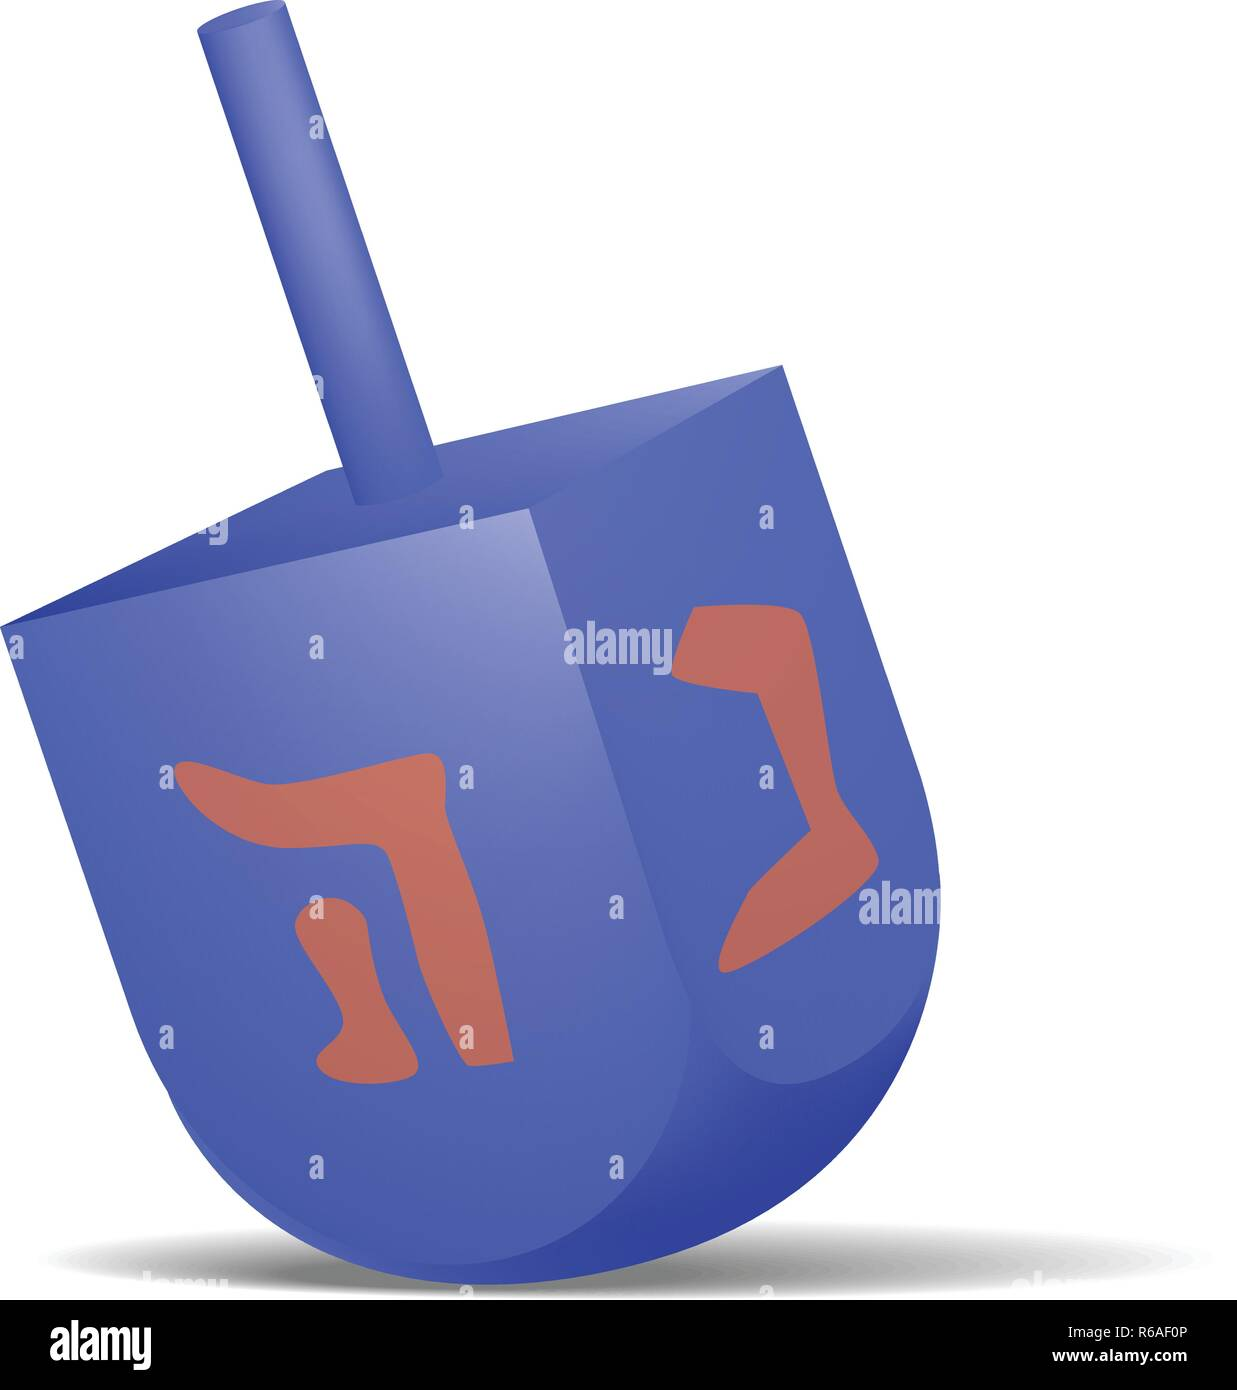 Blue dreidel icon, realistic style - Stock Image